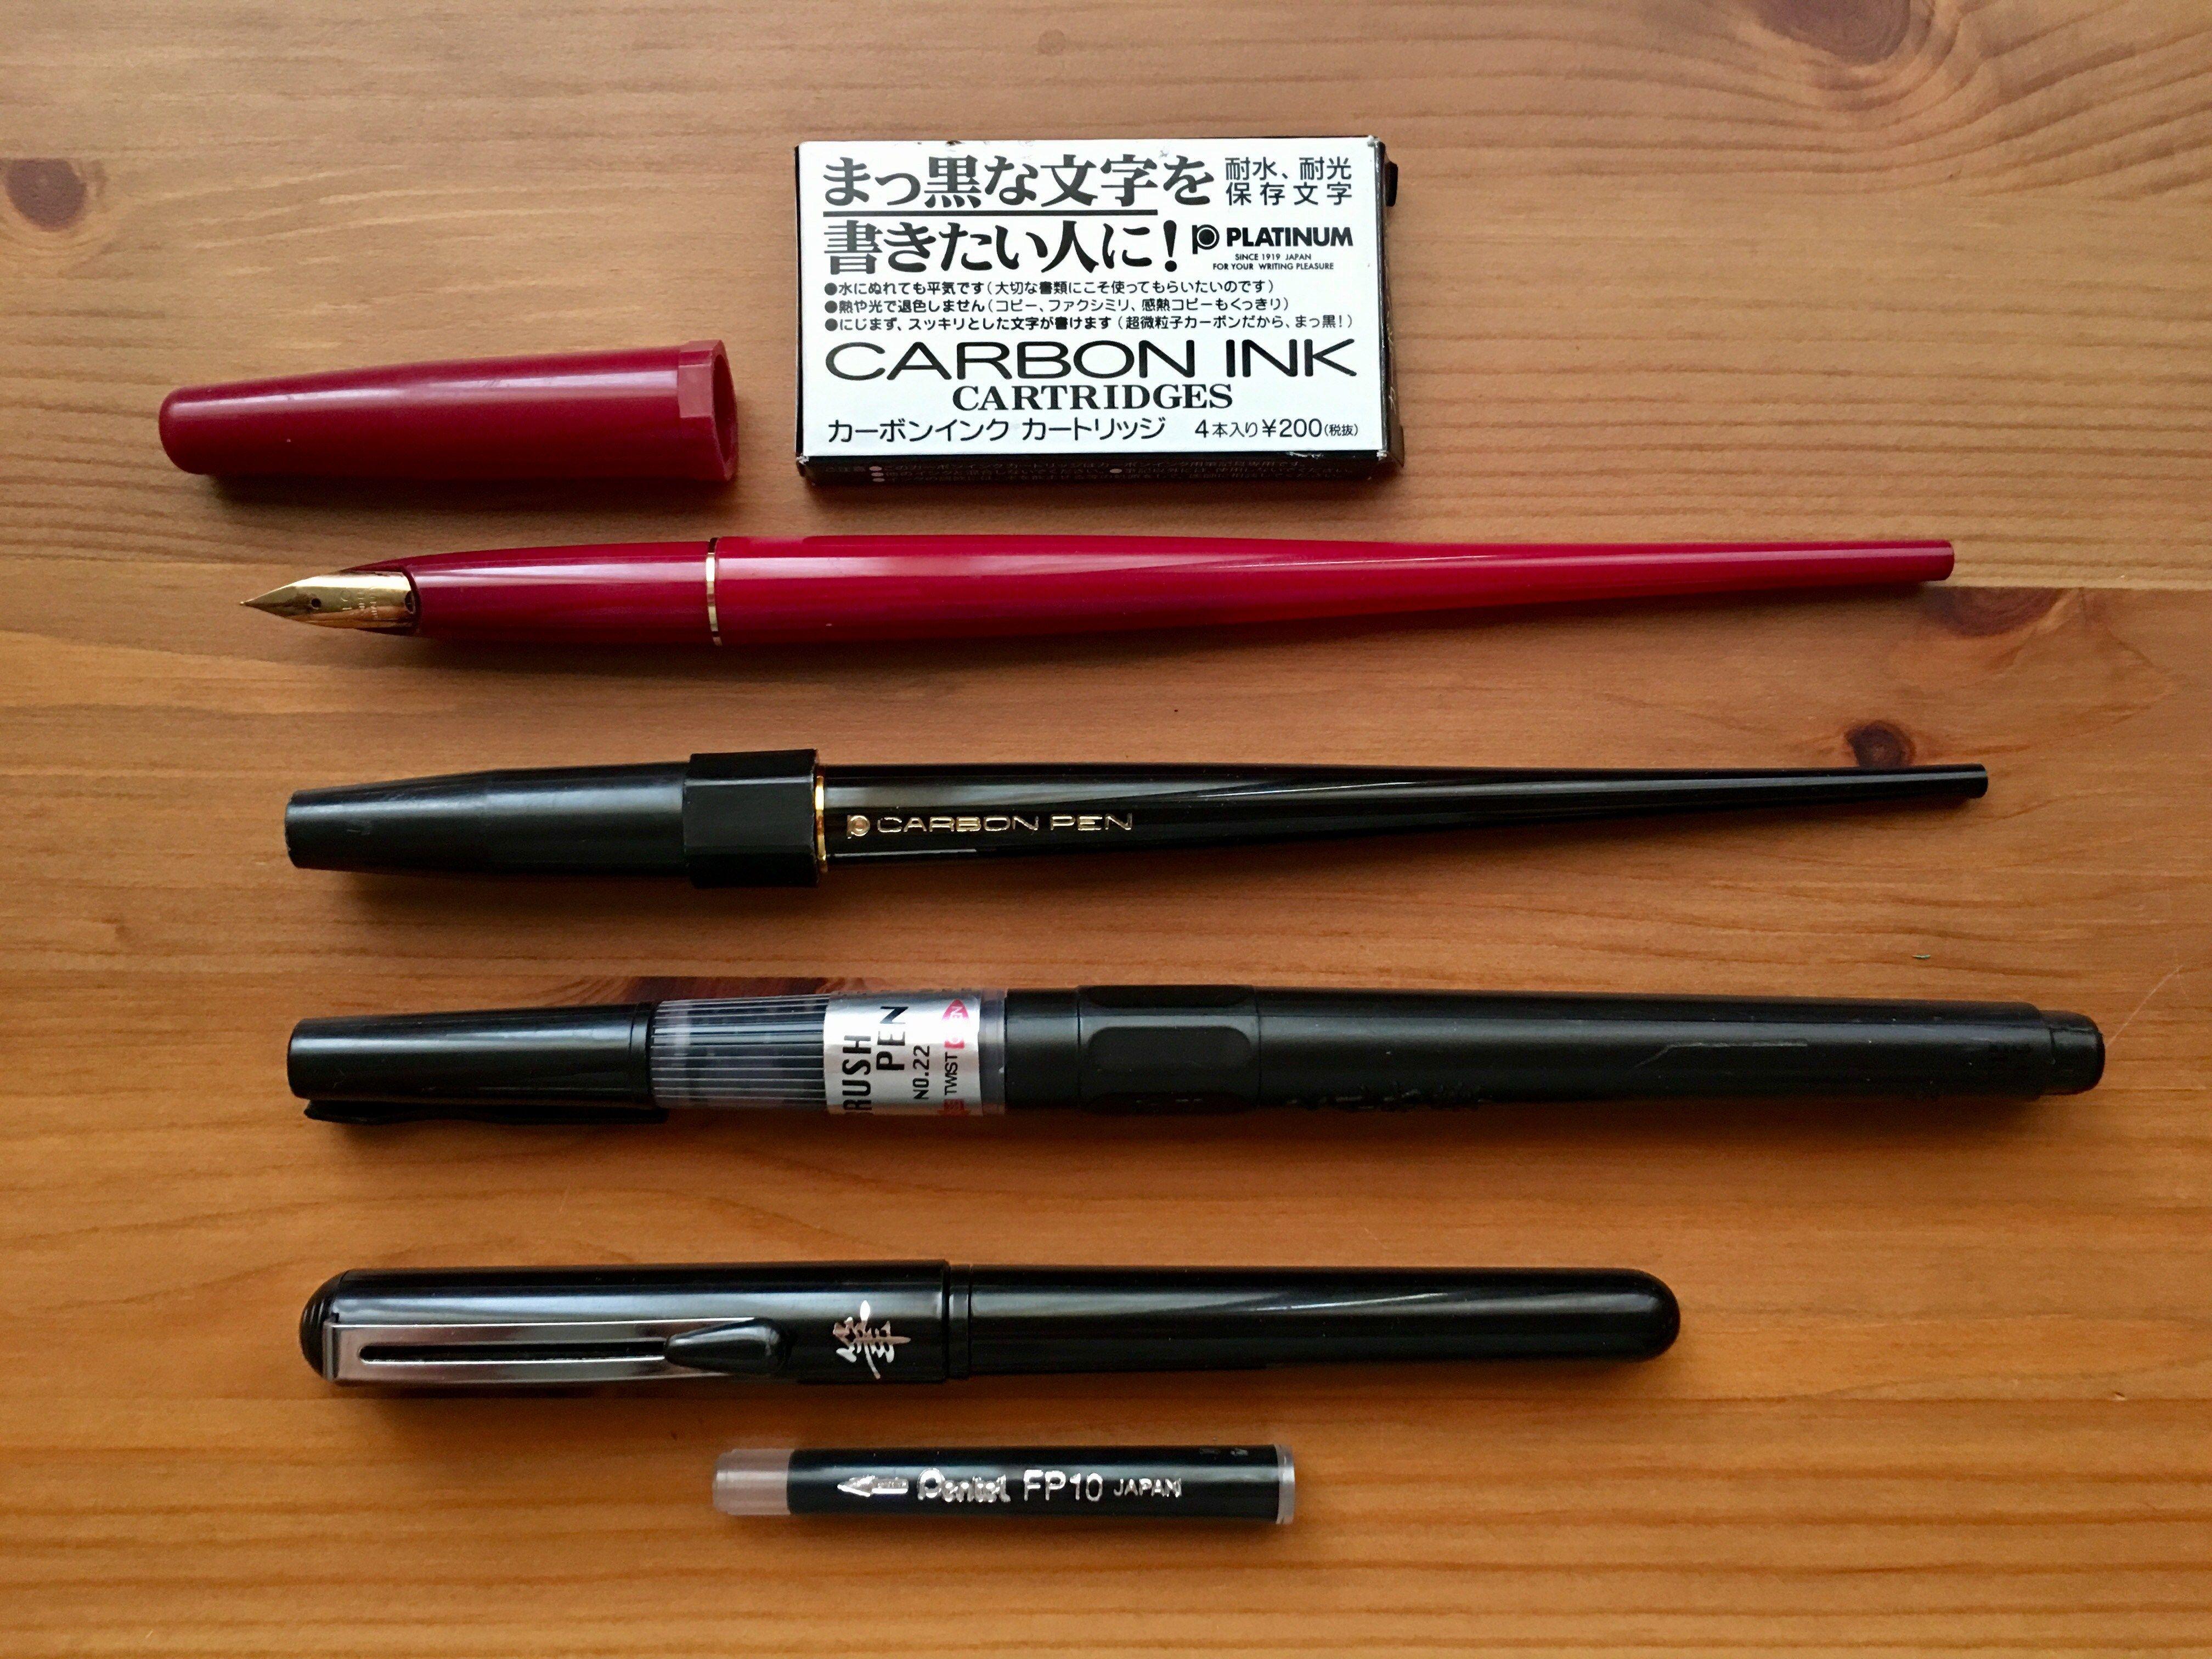 Platinum Carbon Desk Fountain Pen Pilot Zig Cartoonist Brush No 22 Pentel Waterproof Ink